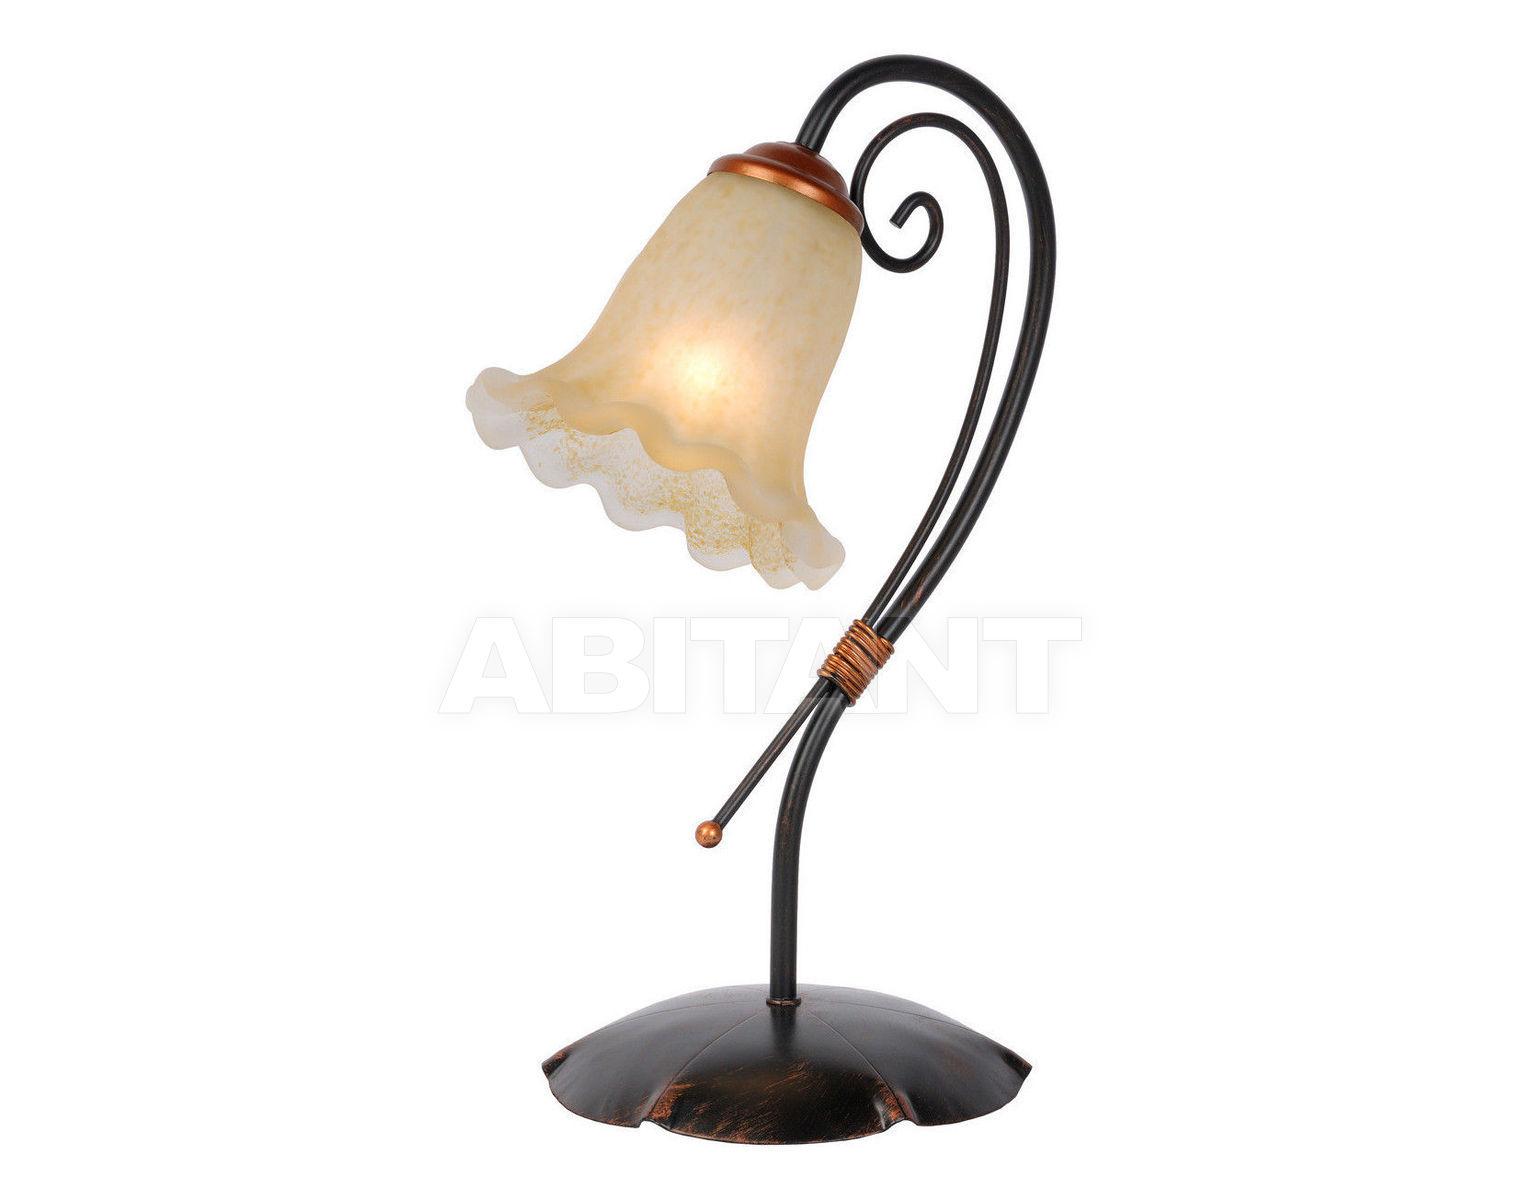 Купить Лампа настольная BORGESI Lucide  Classic 78565/01/97